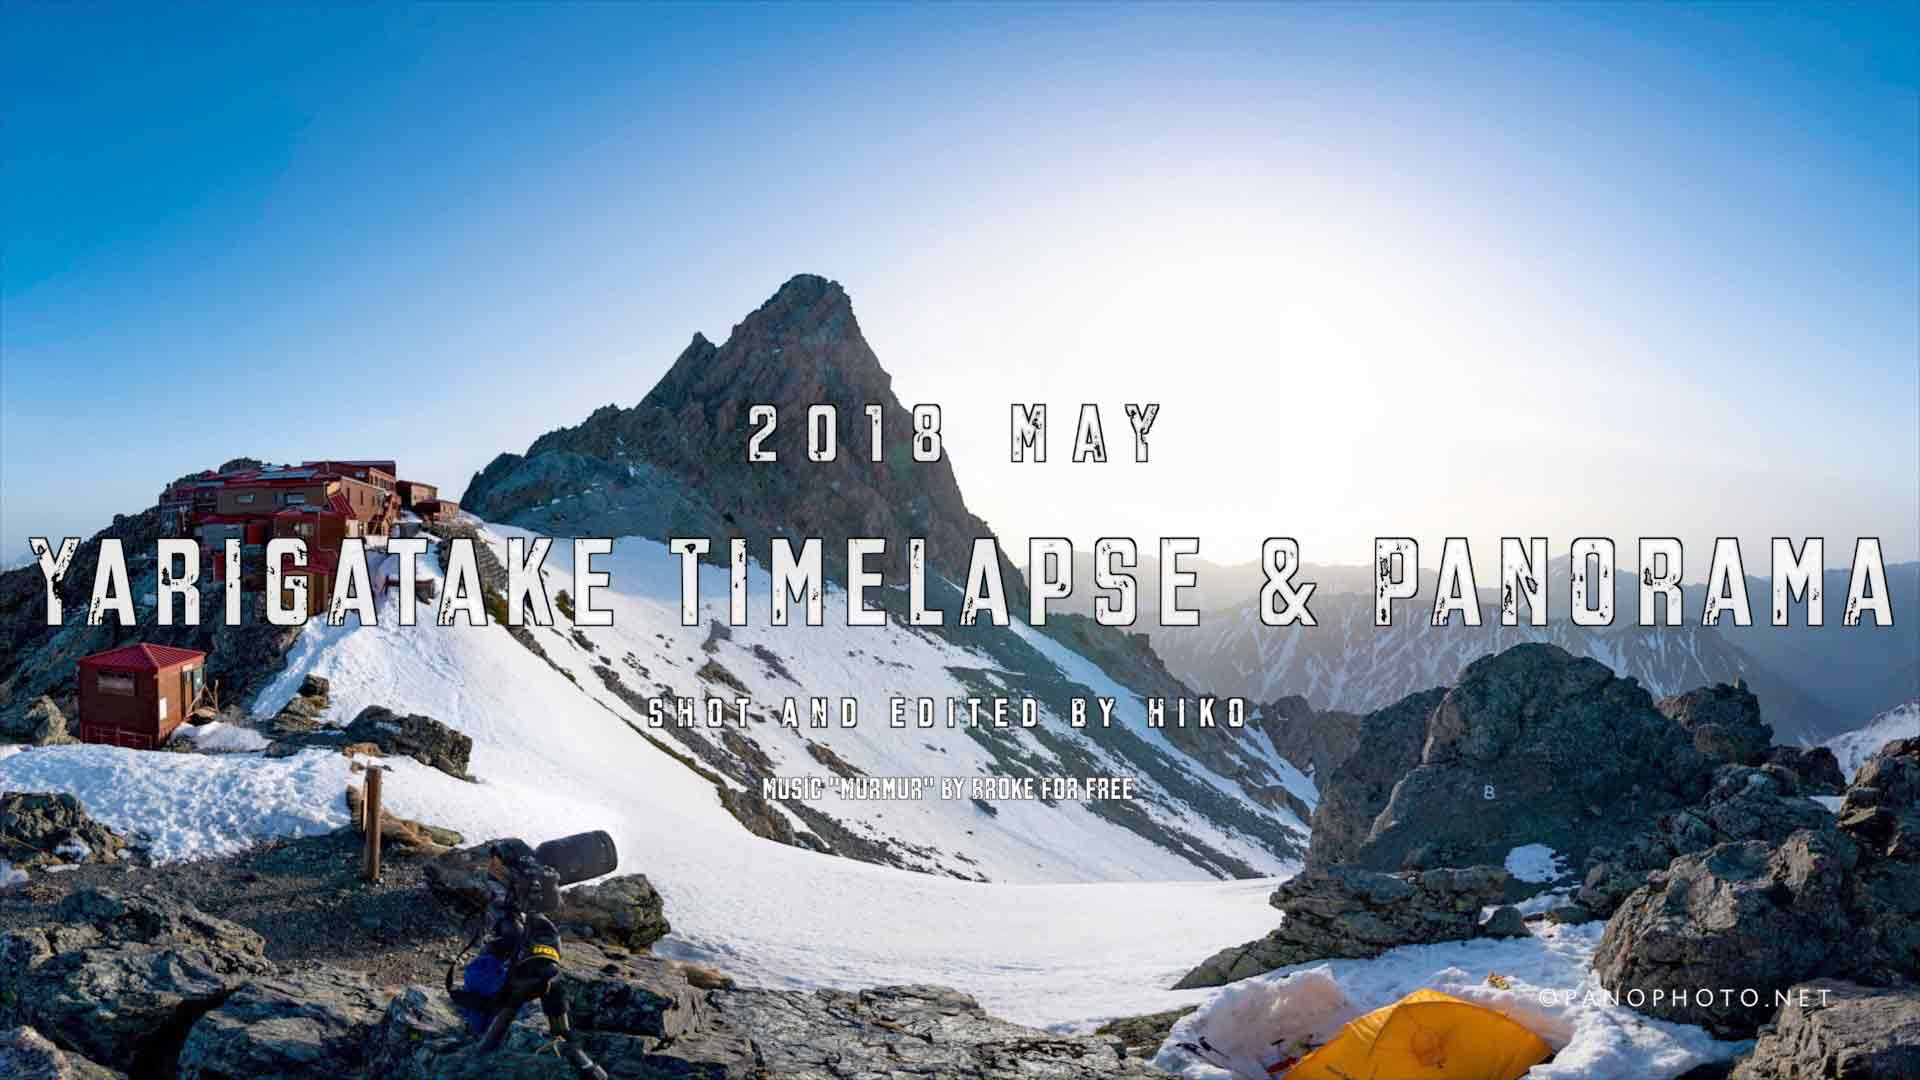 2018-May-Yarigatake-Timelapse-and-Panorama-Featured-Image